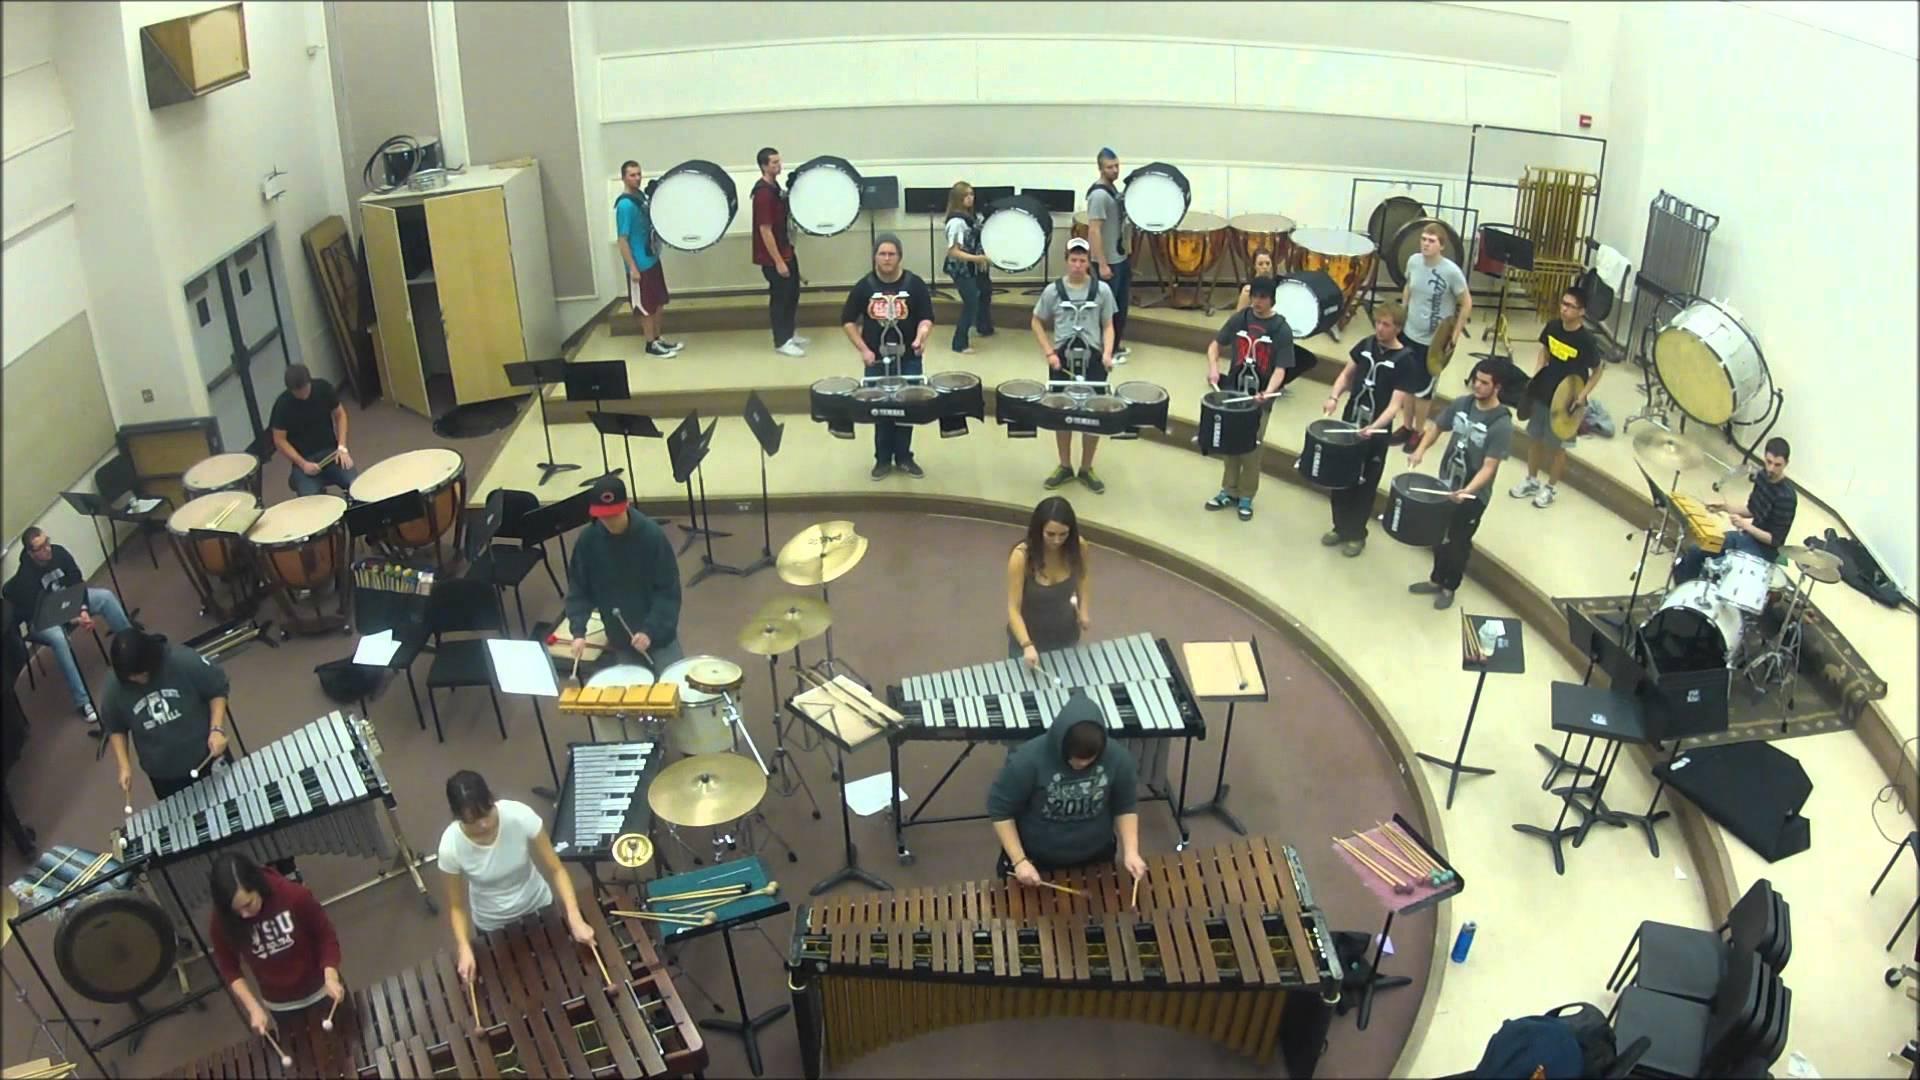 2012 WSU Indoor Drumline, early season standstill. DJ Shadow